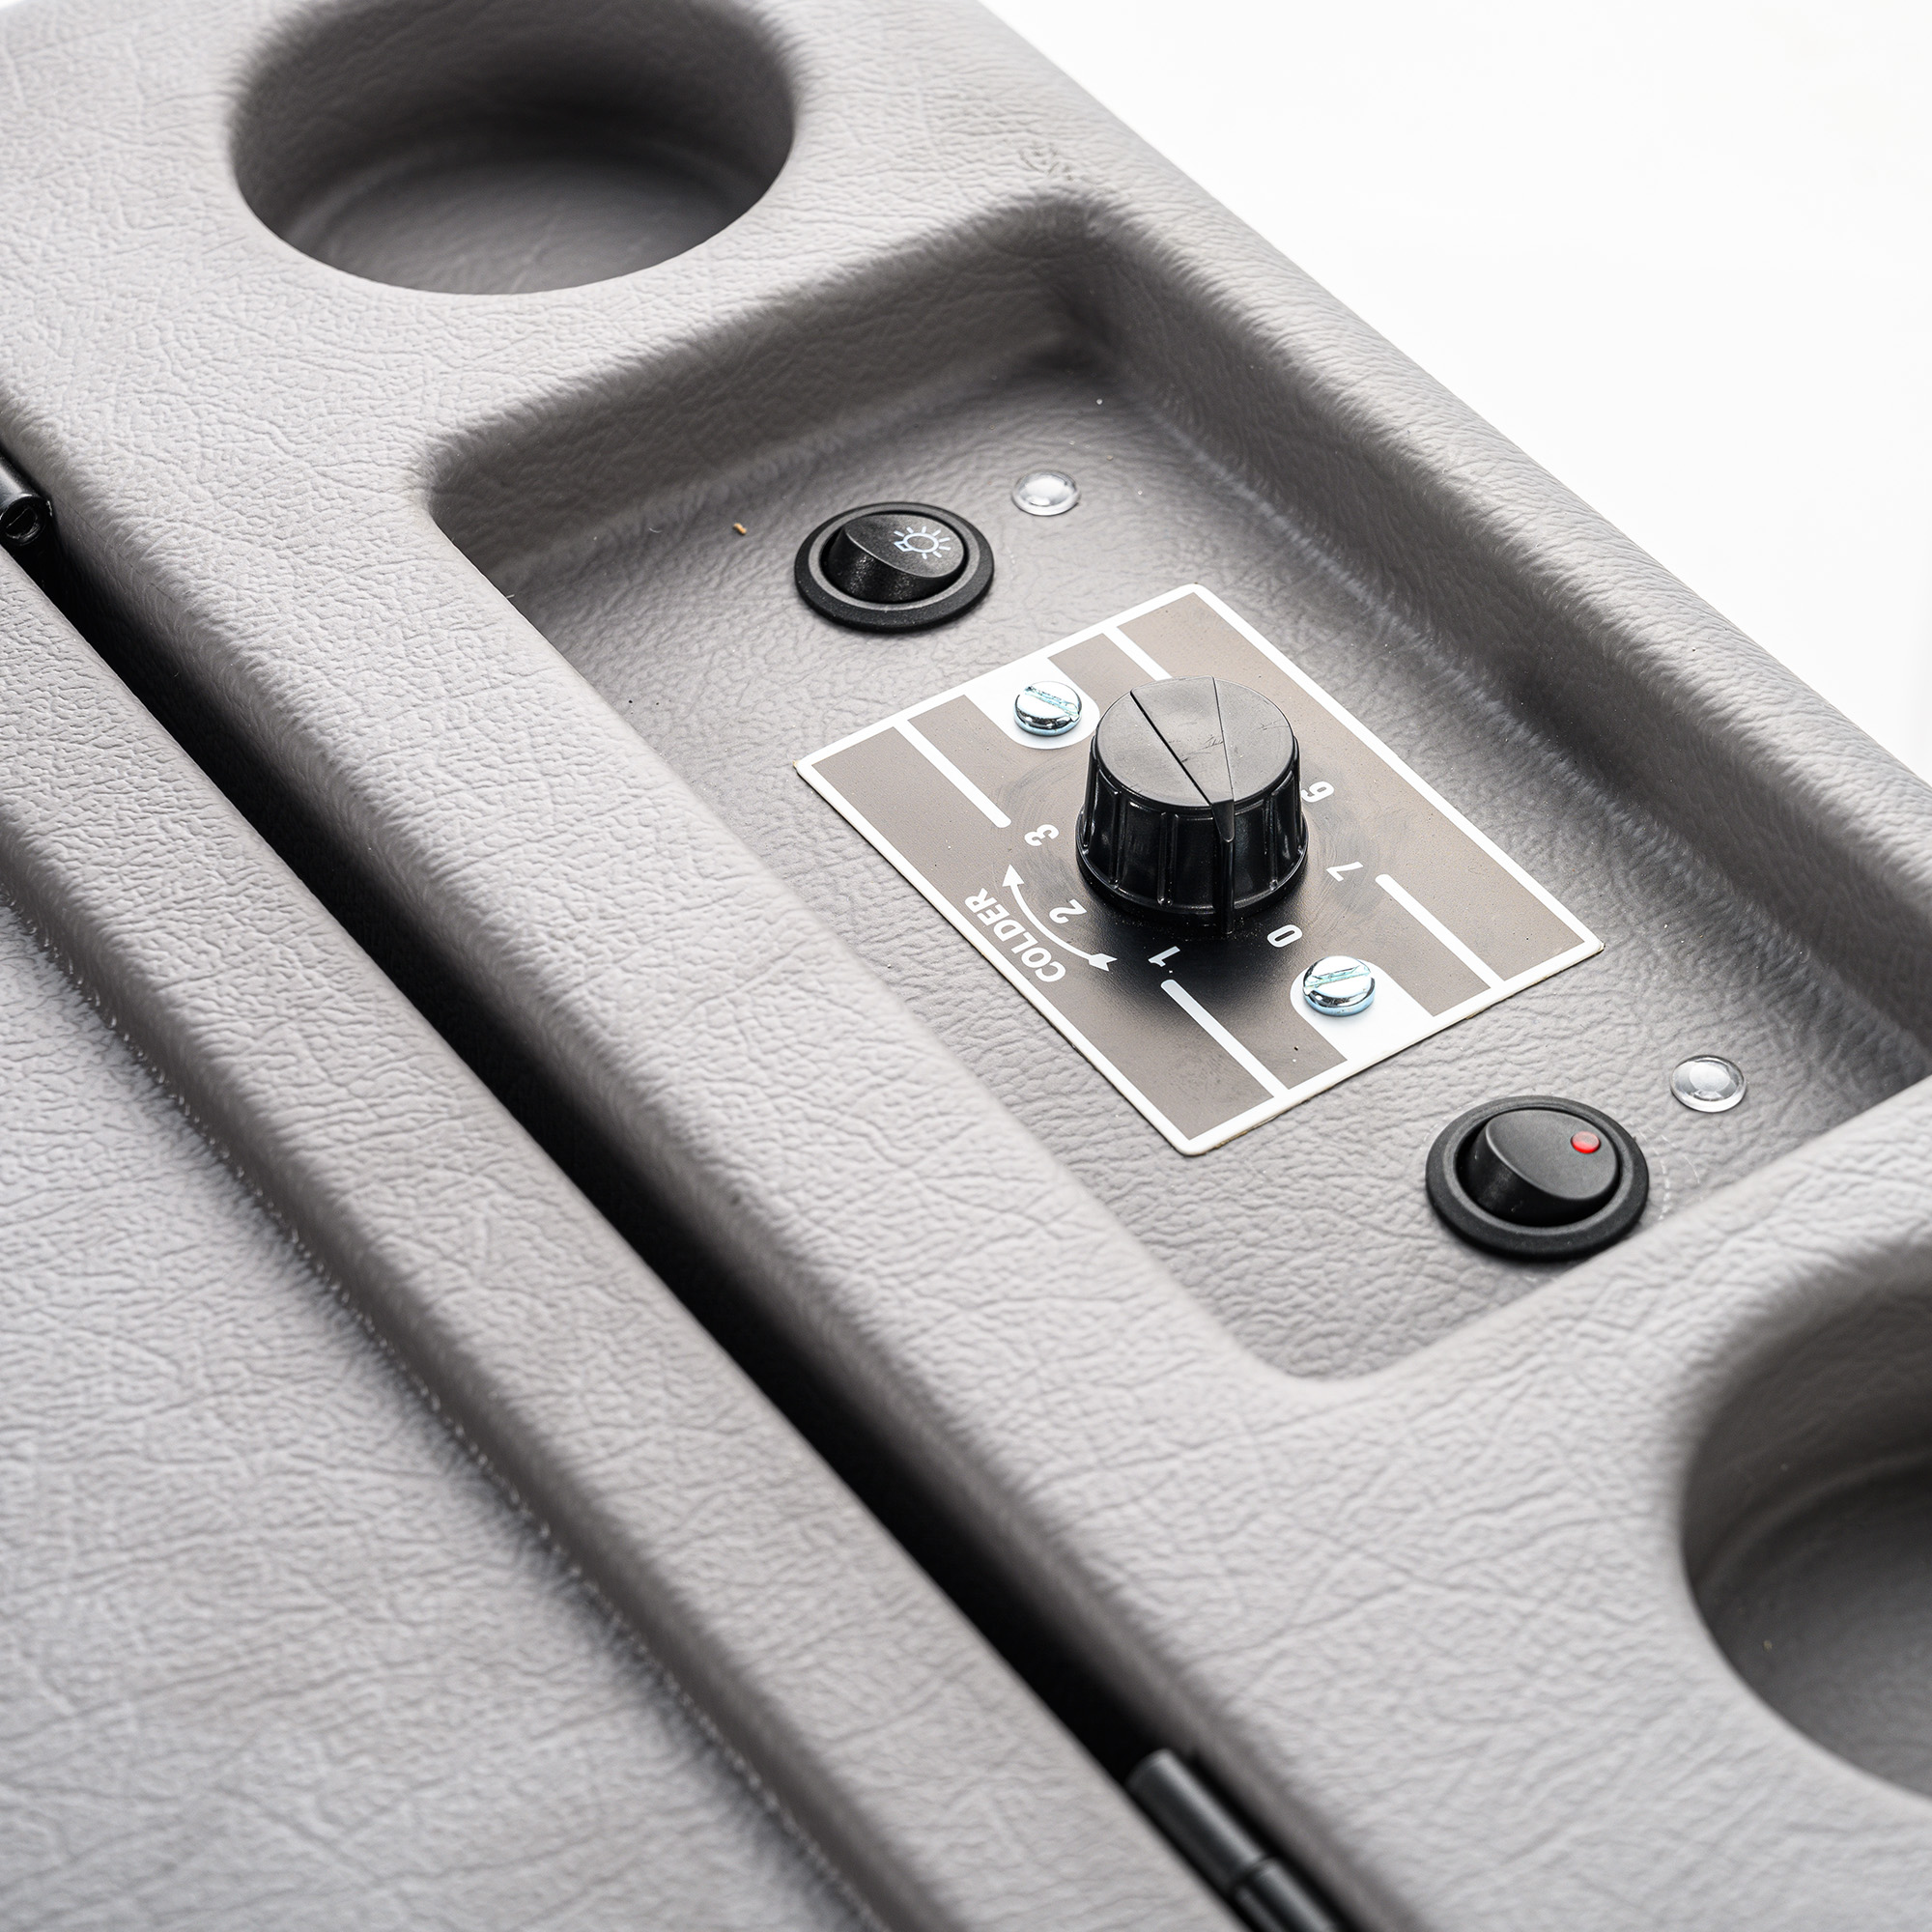 MPO 4230 21 LT Soğutucu Araç Buzdolabı